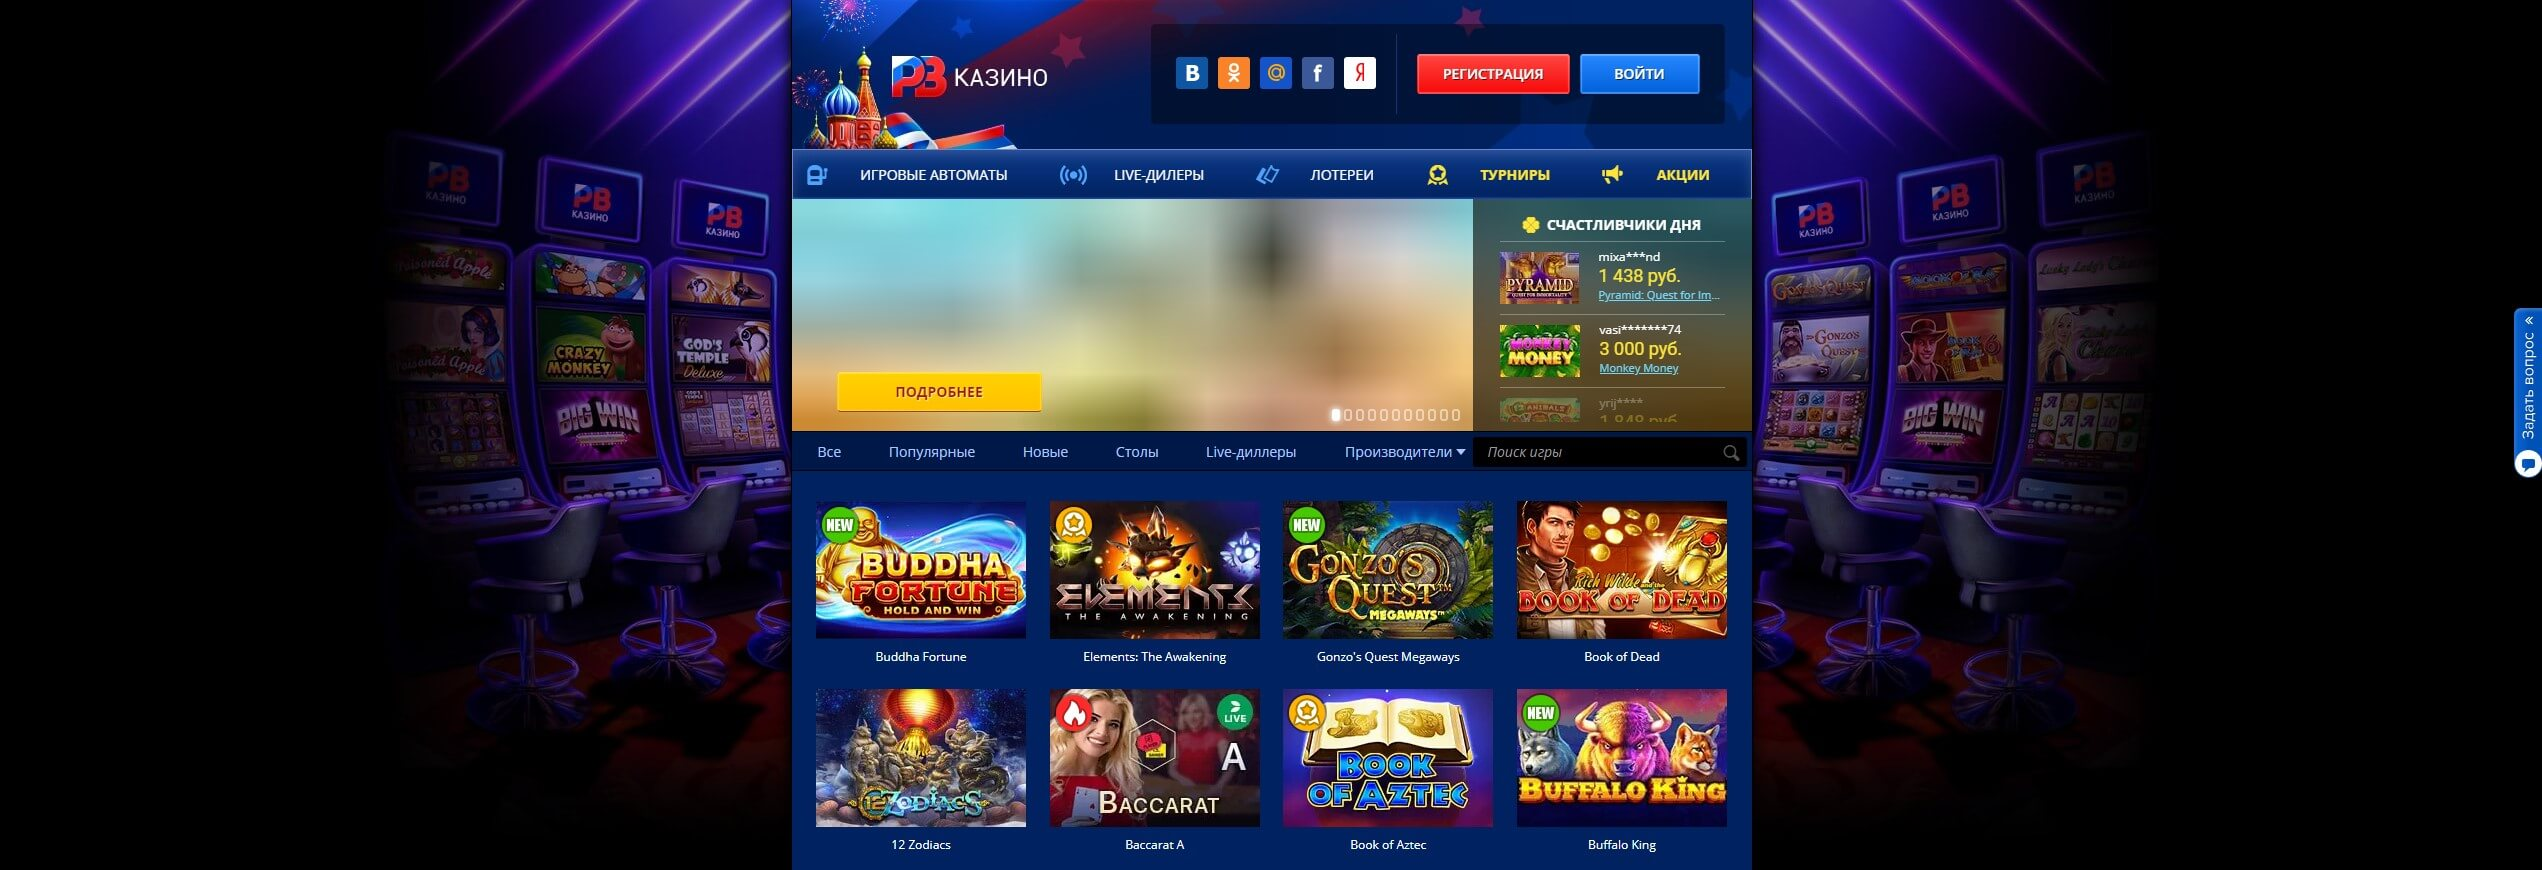 rv casino официальный сайт